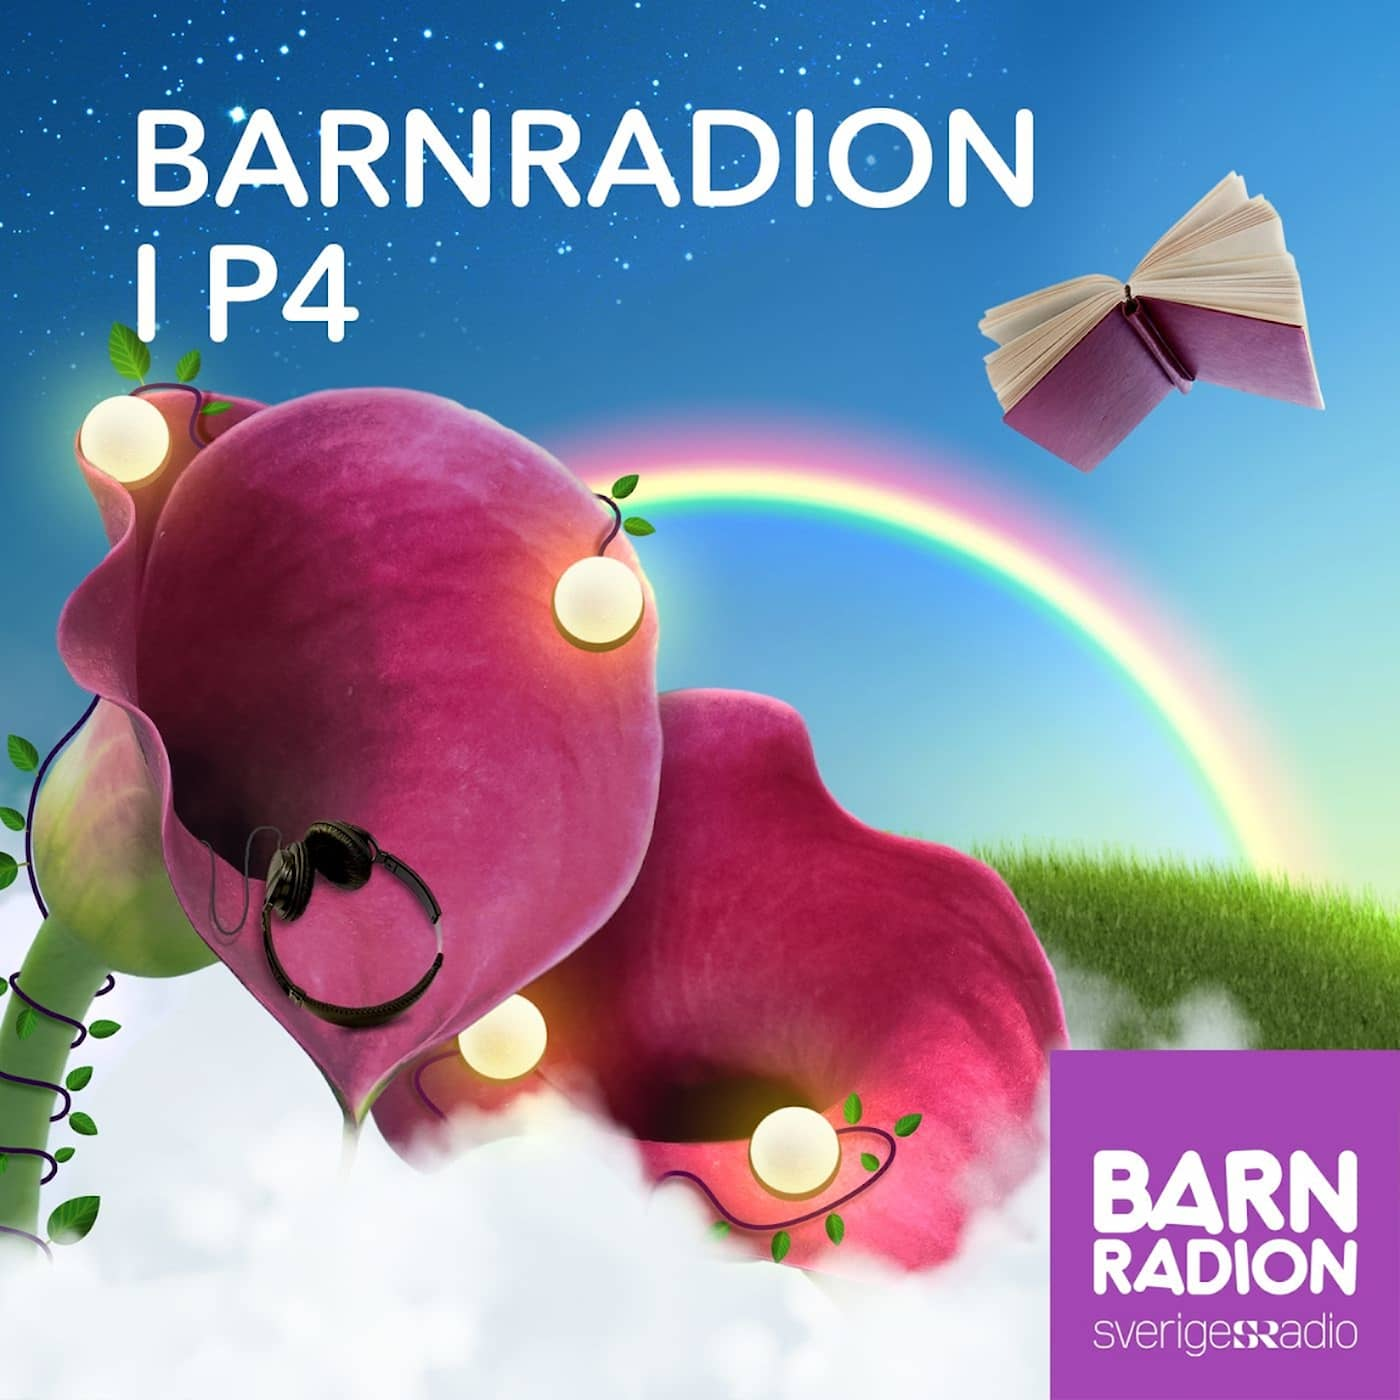 Barnradion i P4